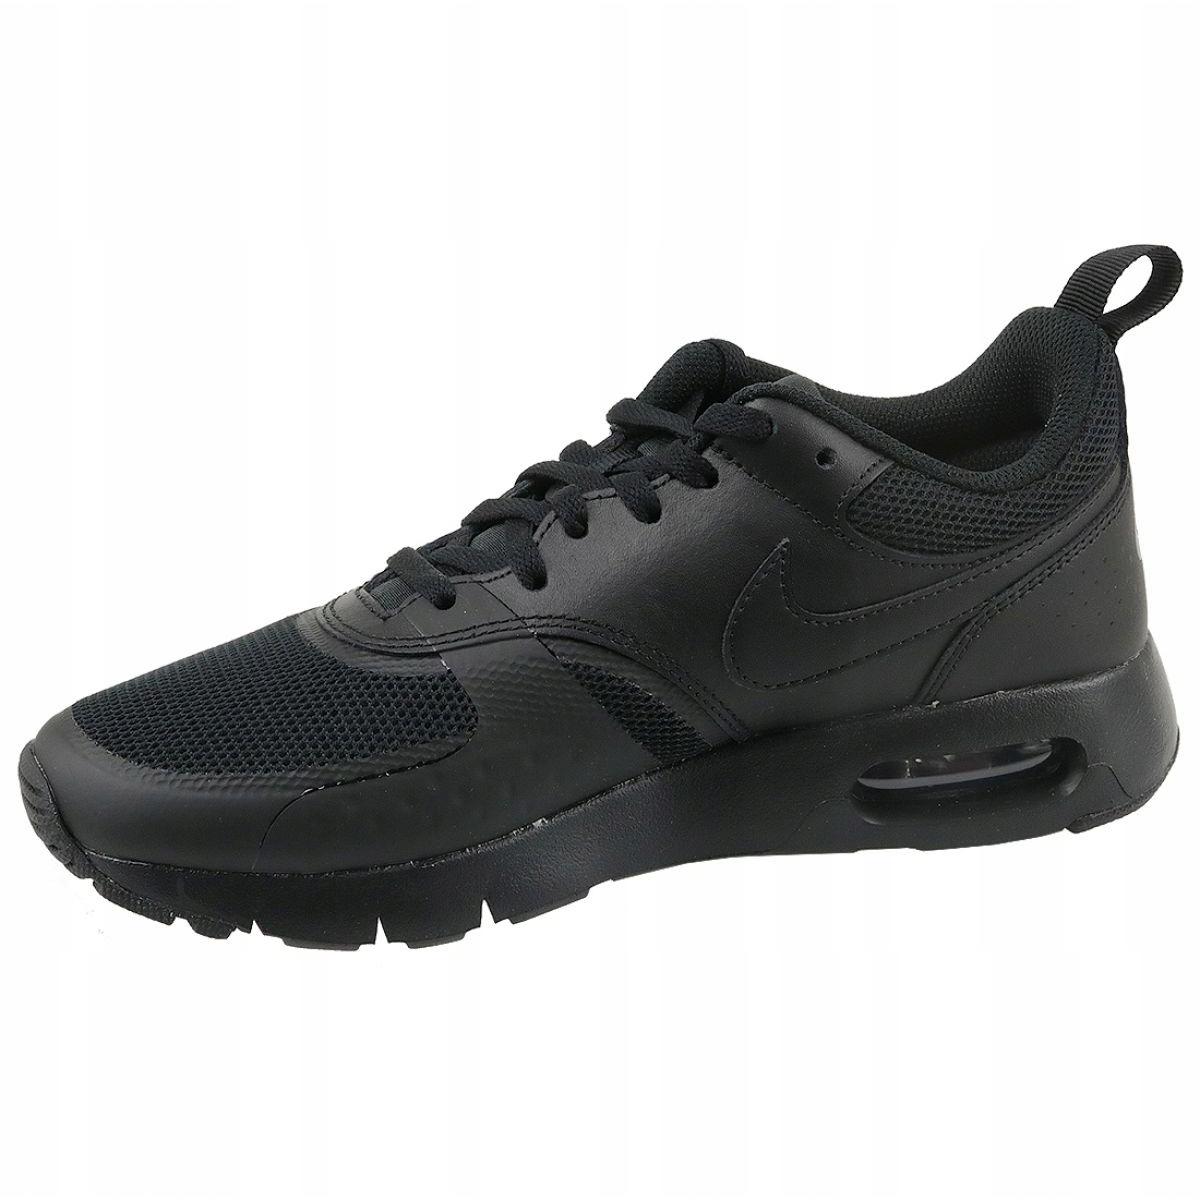 Nike Men's Air Max Vision Shoes Black